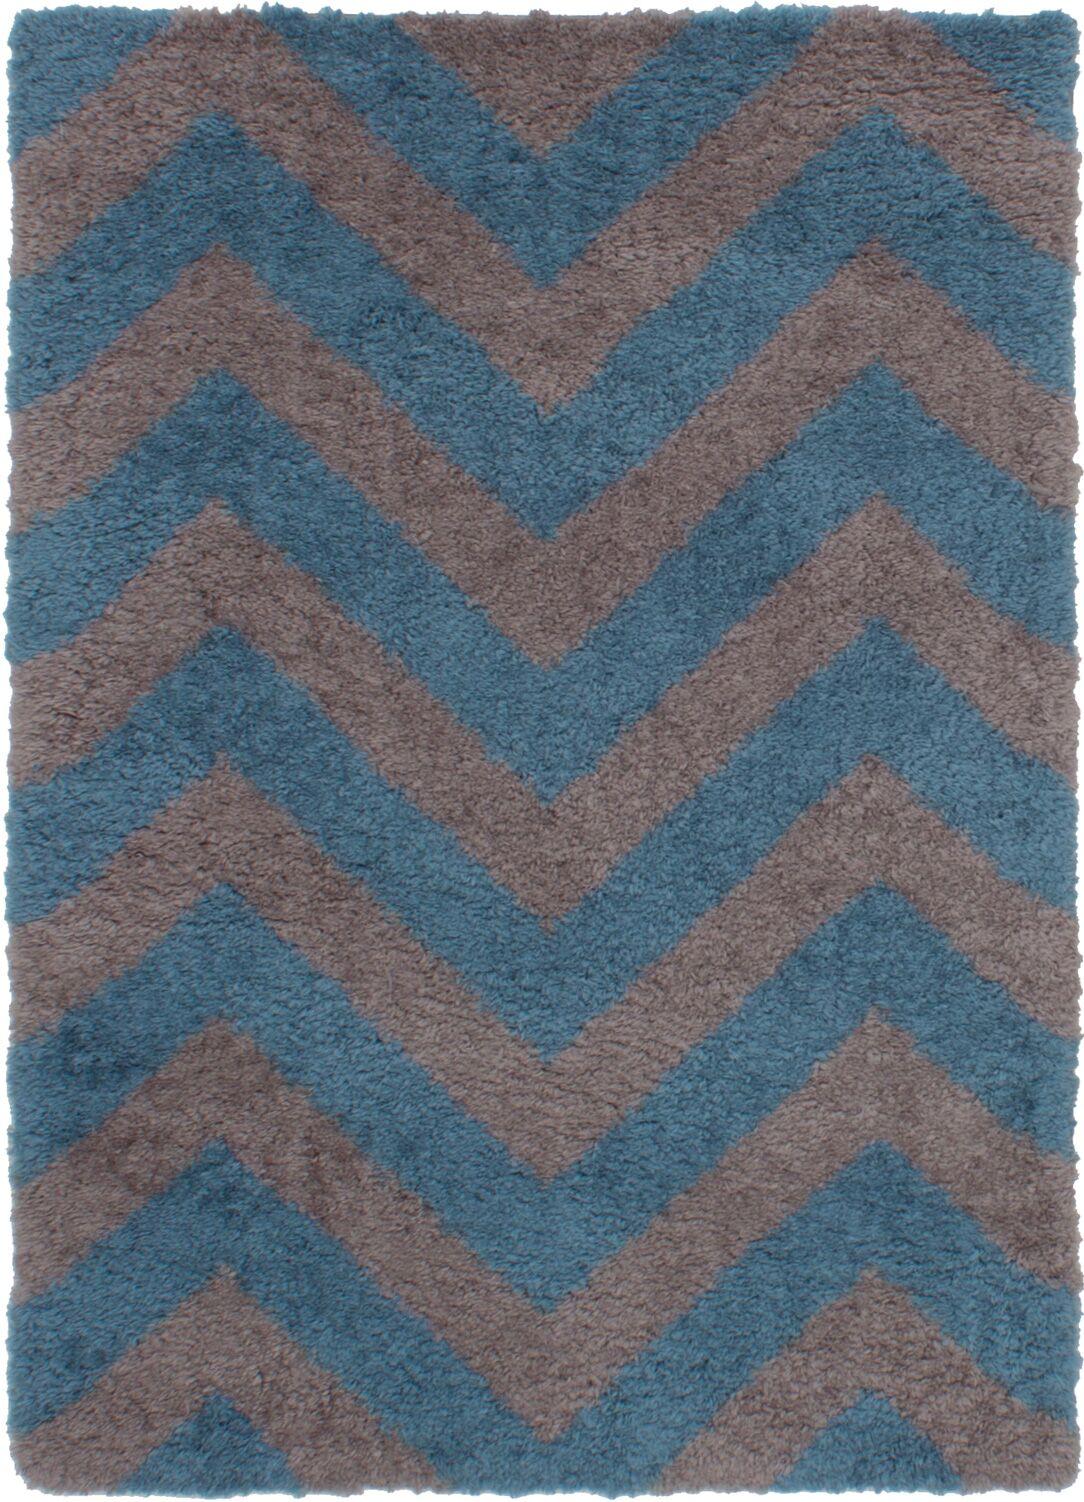 Maclennan Gray/Turquoise Area Rug